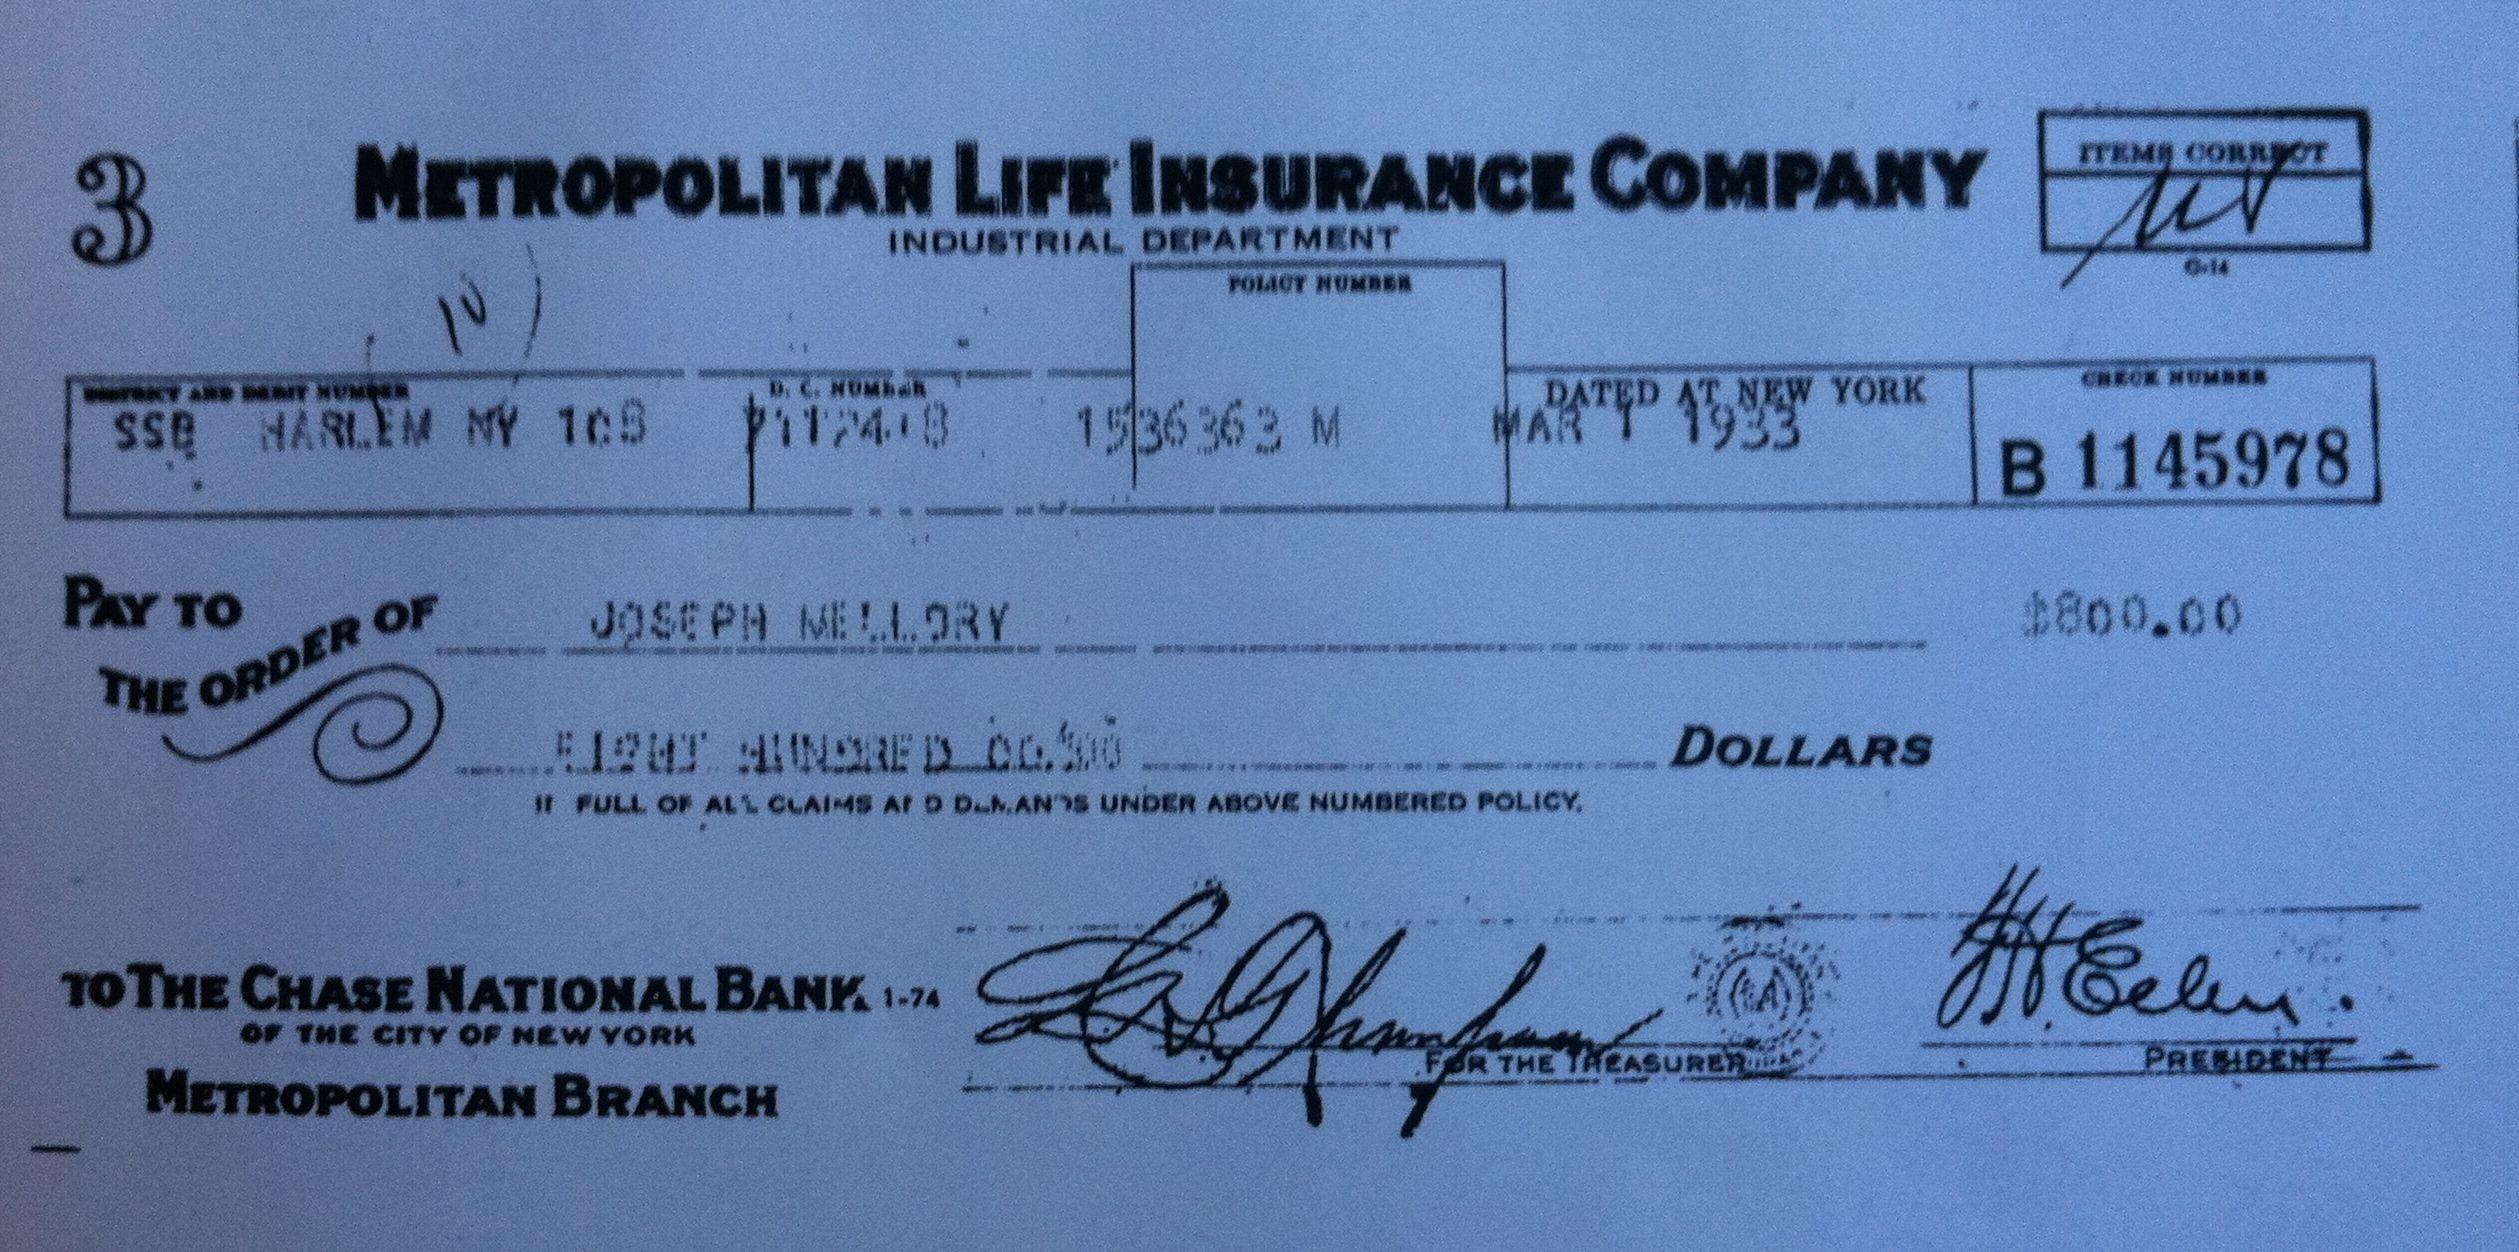 Insurance Check Life Insurance Companies Insurance Check The Man